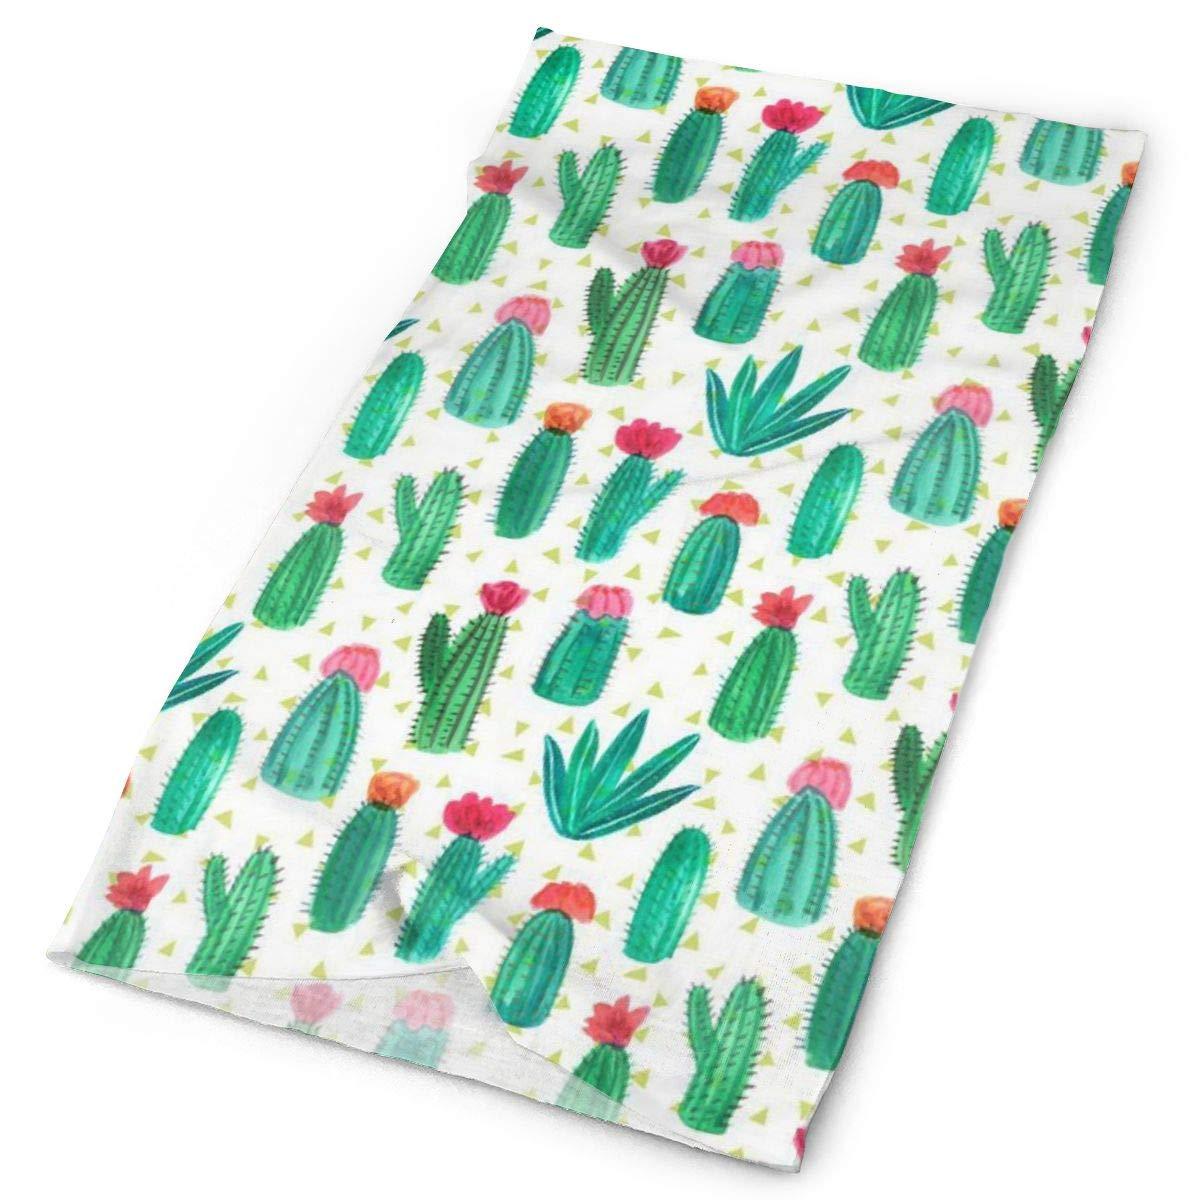 SHINYWEET Desert Cactus Flower Outdoors & Daily Headwear - 16 Ways to Wear Headband/Neck Gaiter/Bandana/Helmet